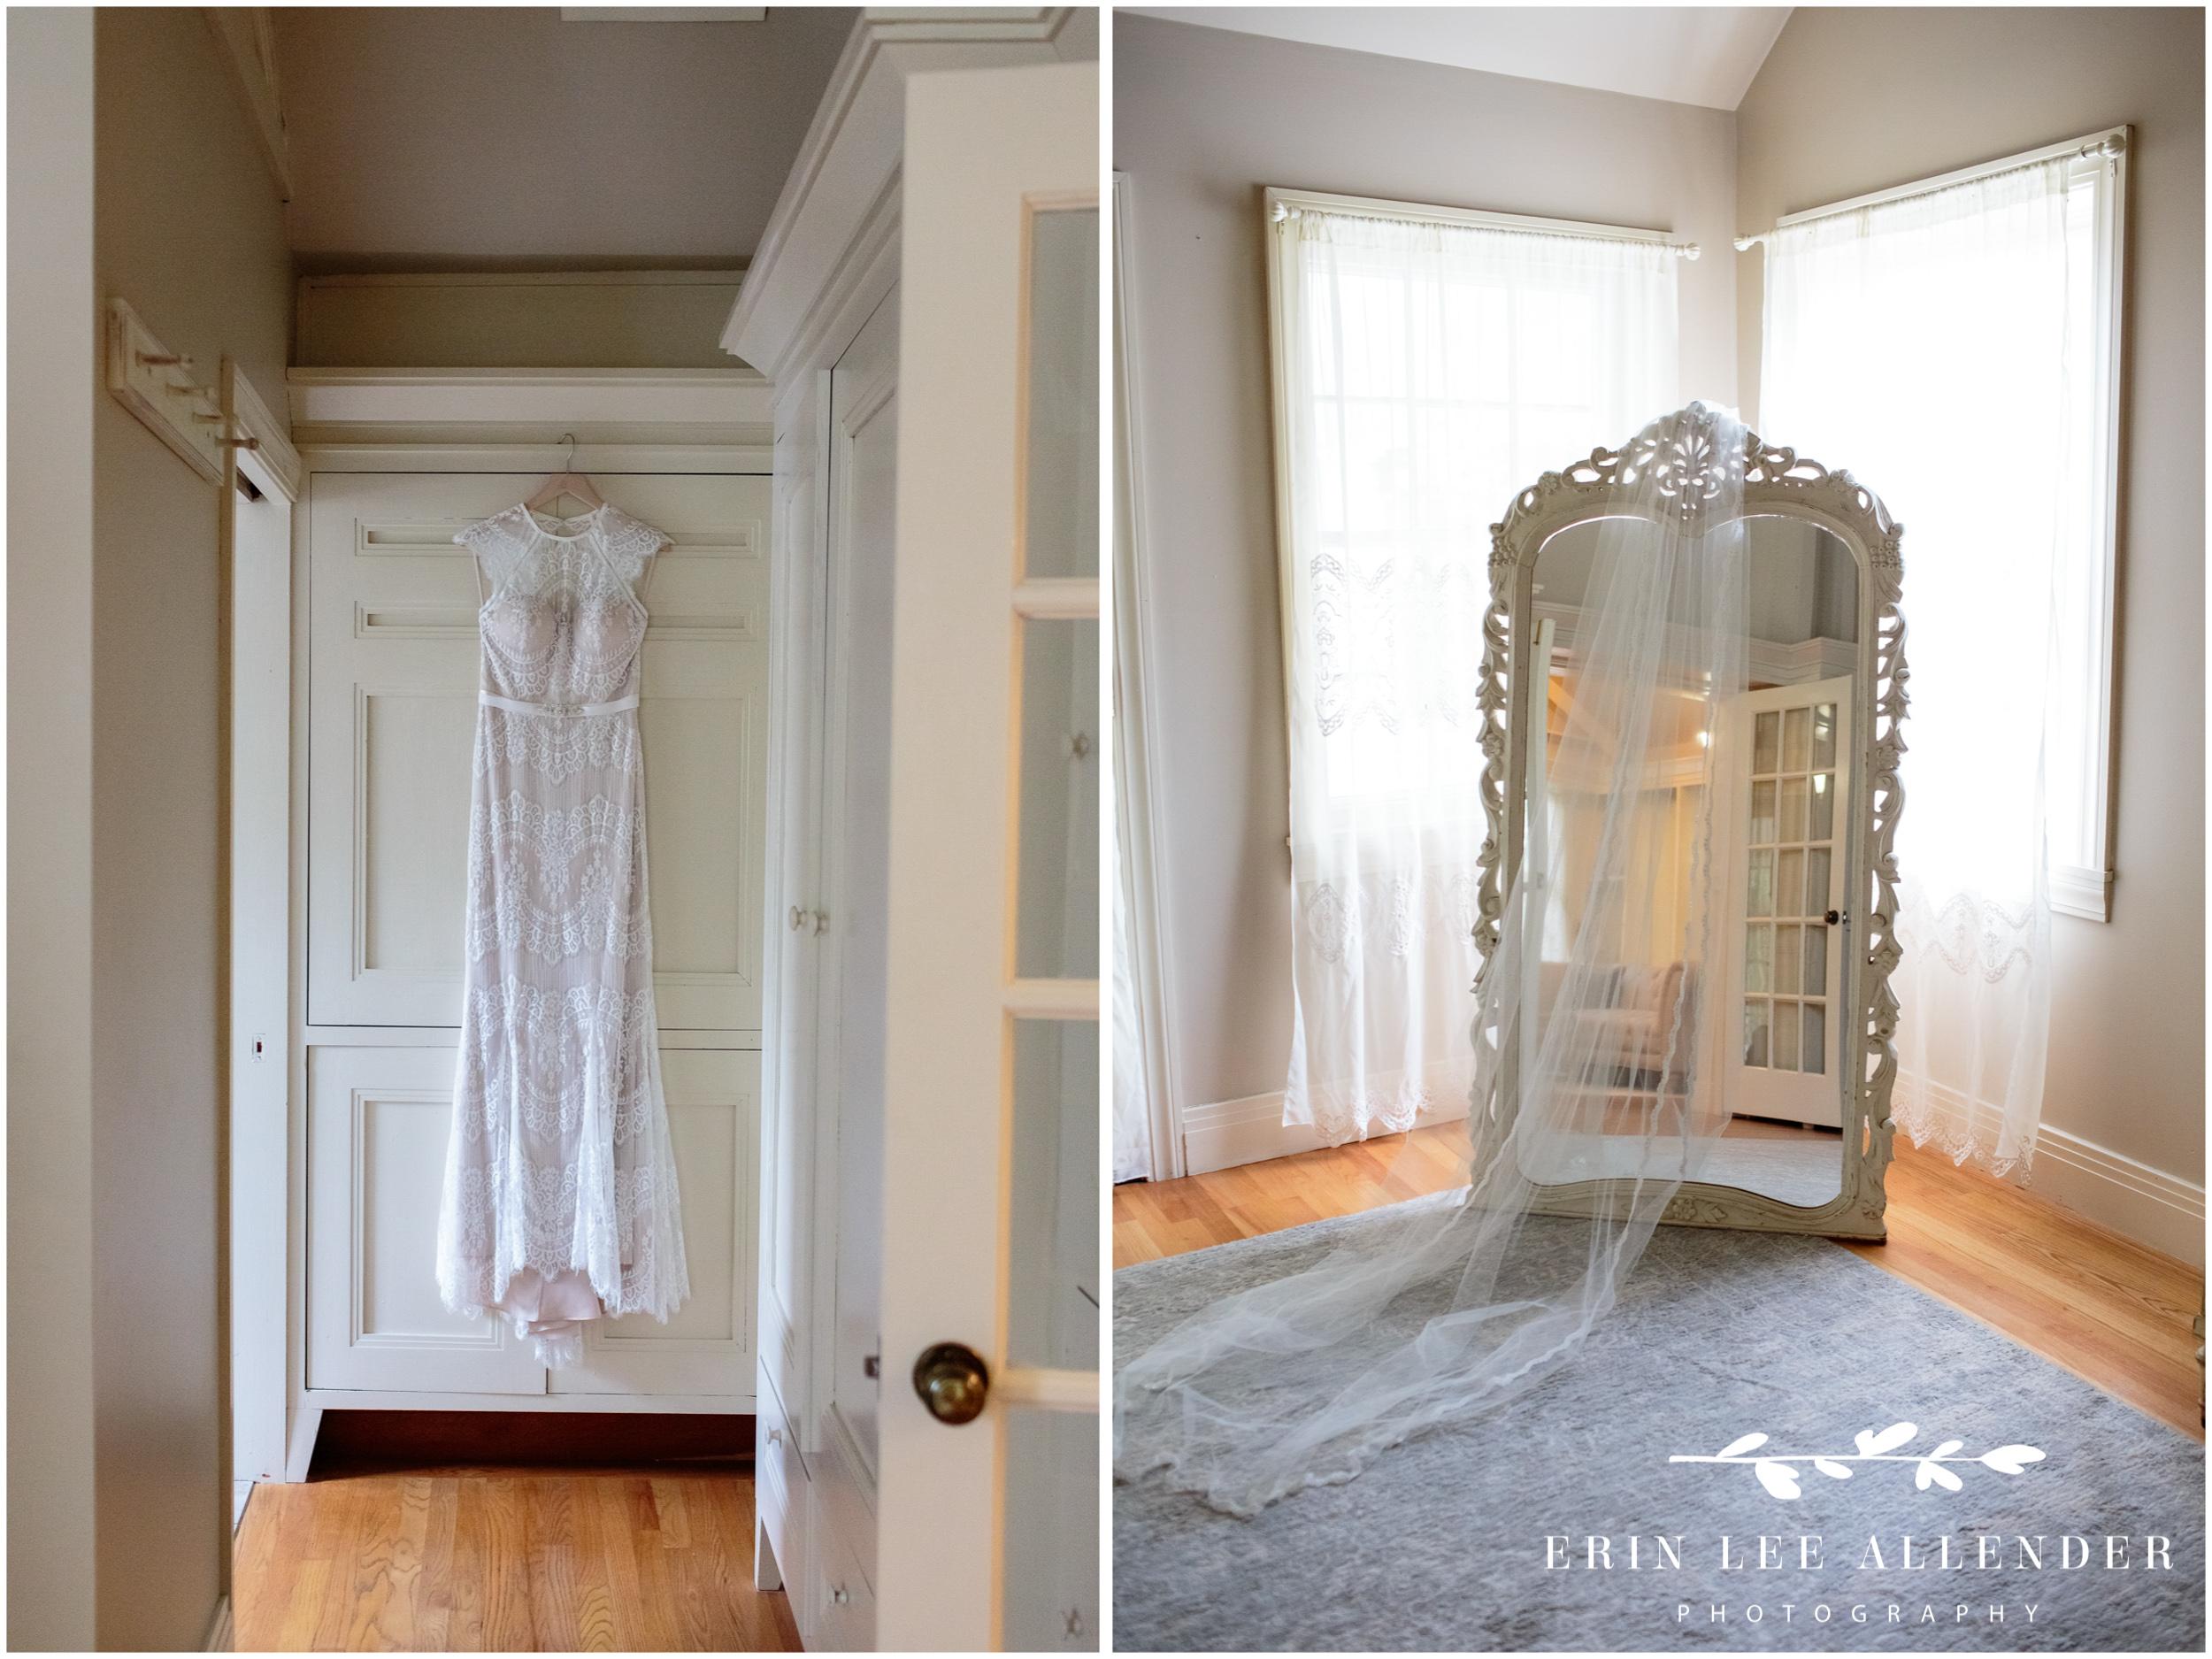 Bride's-dress-hanging